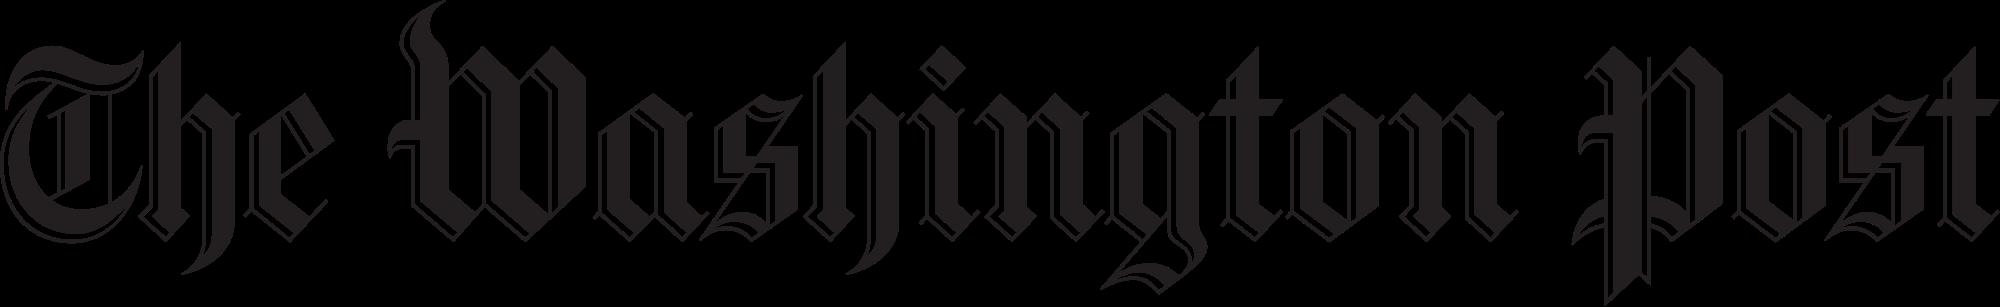 washington post logo miya ando american university museum.png